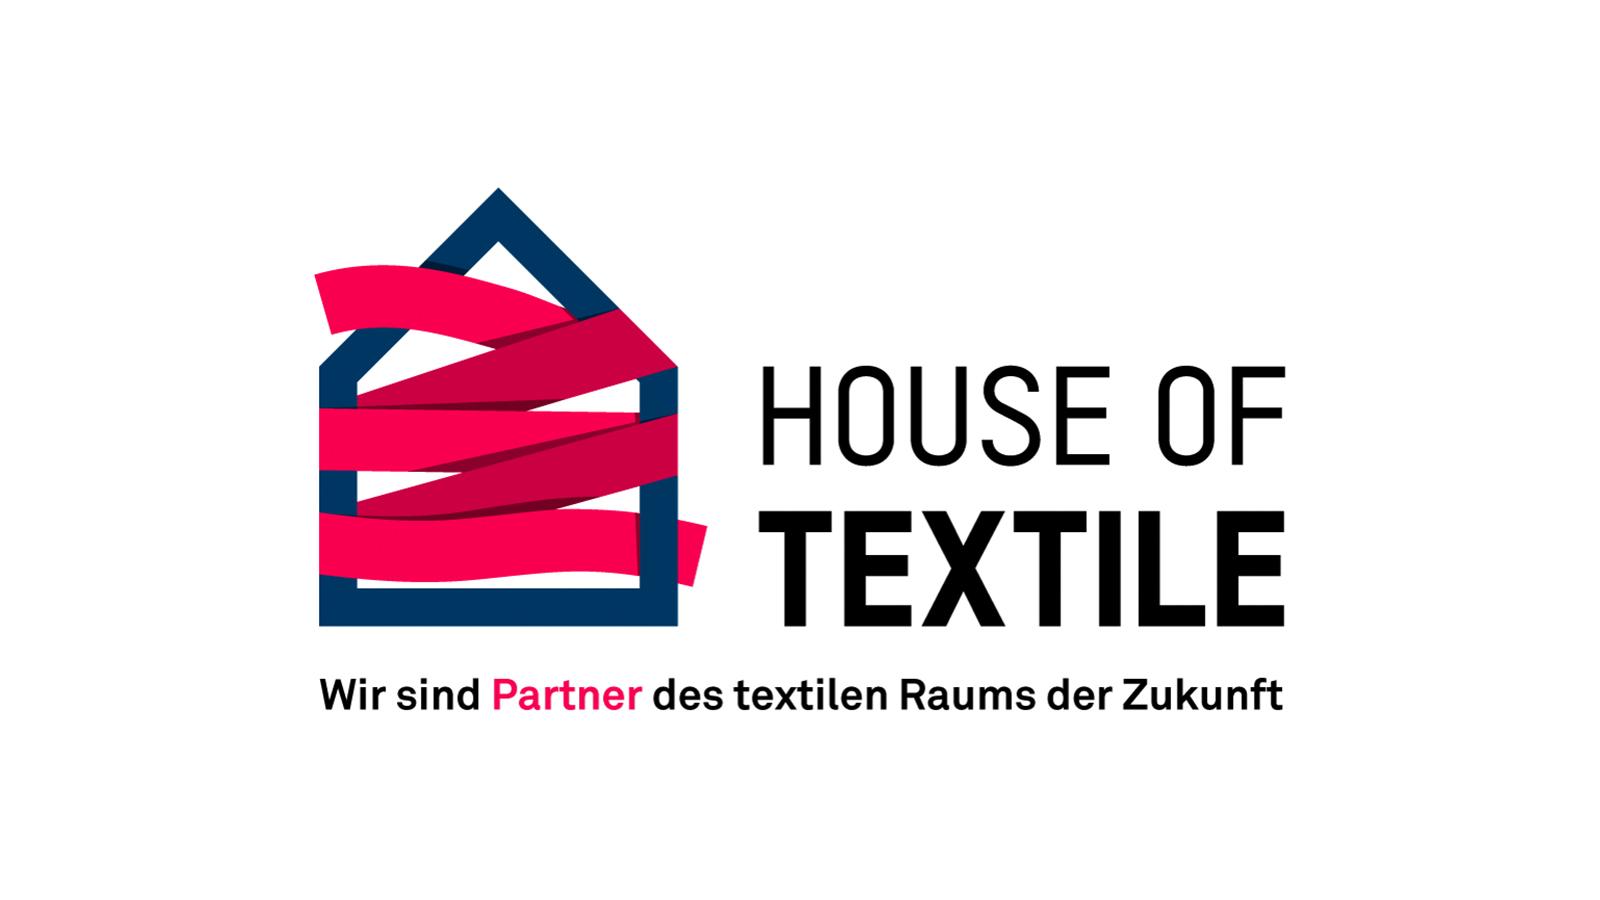 Houseoftextile_1600x900px